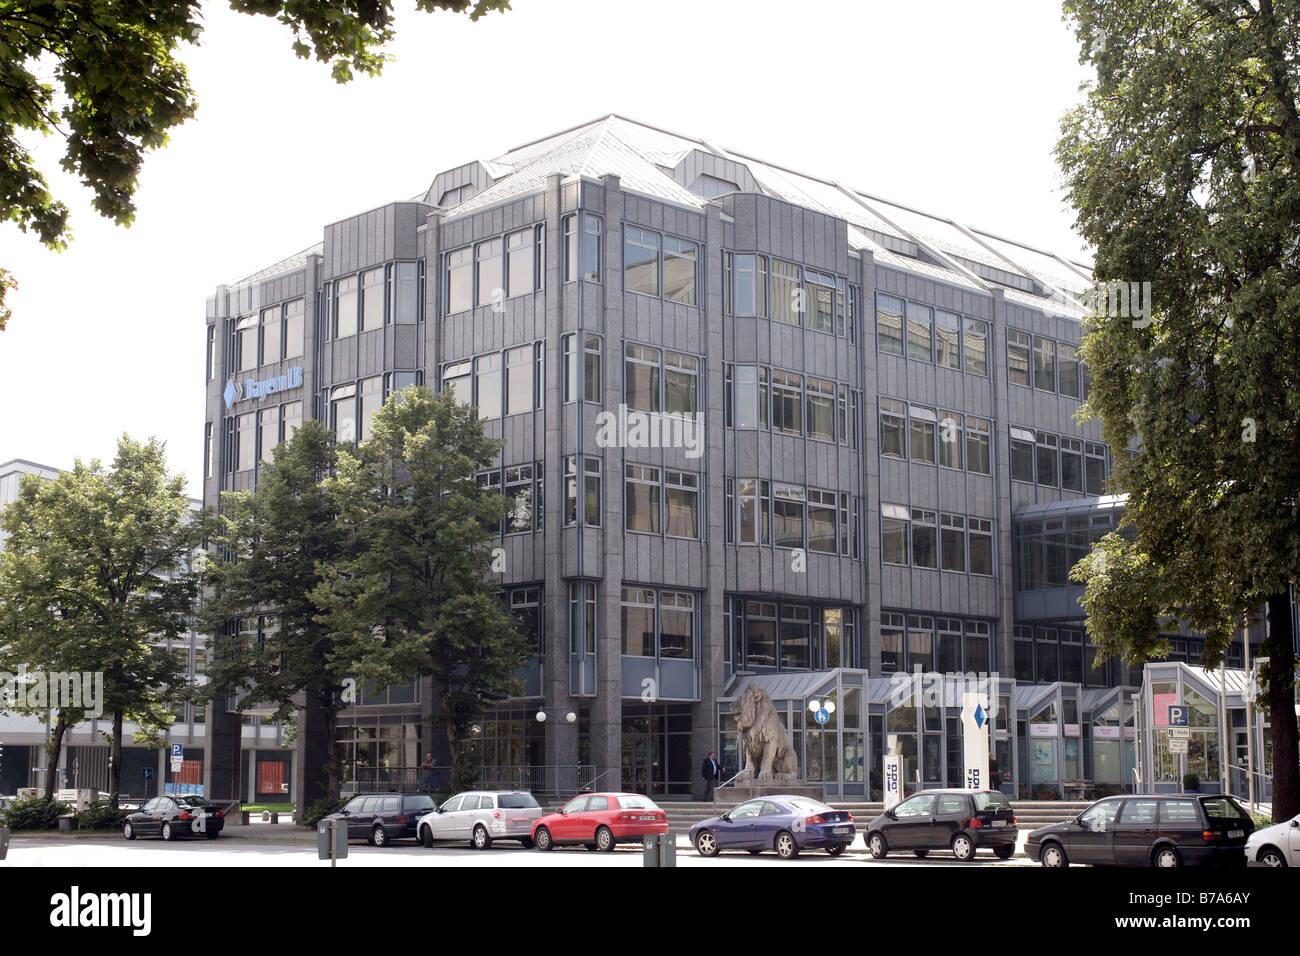 Bayern LB Bank Headquarters in Munich, Bavaria, Germany, Europe - Stock Image